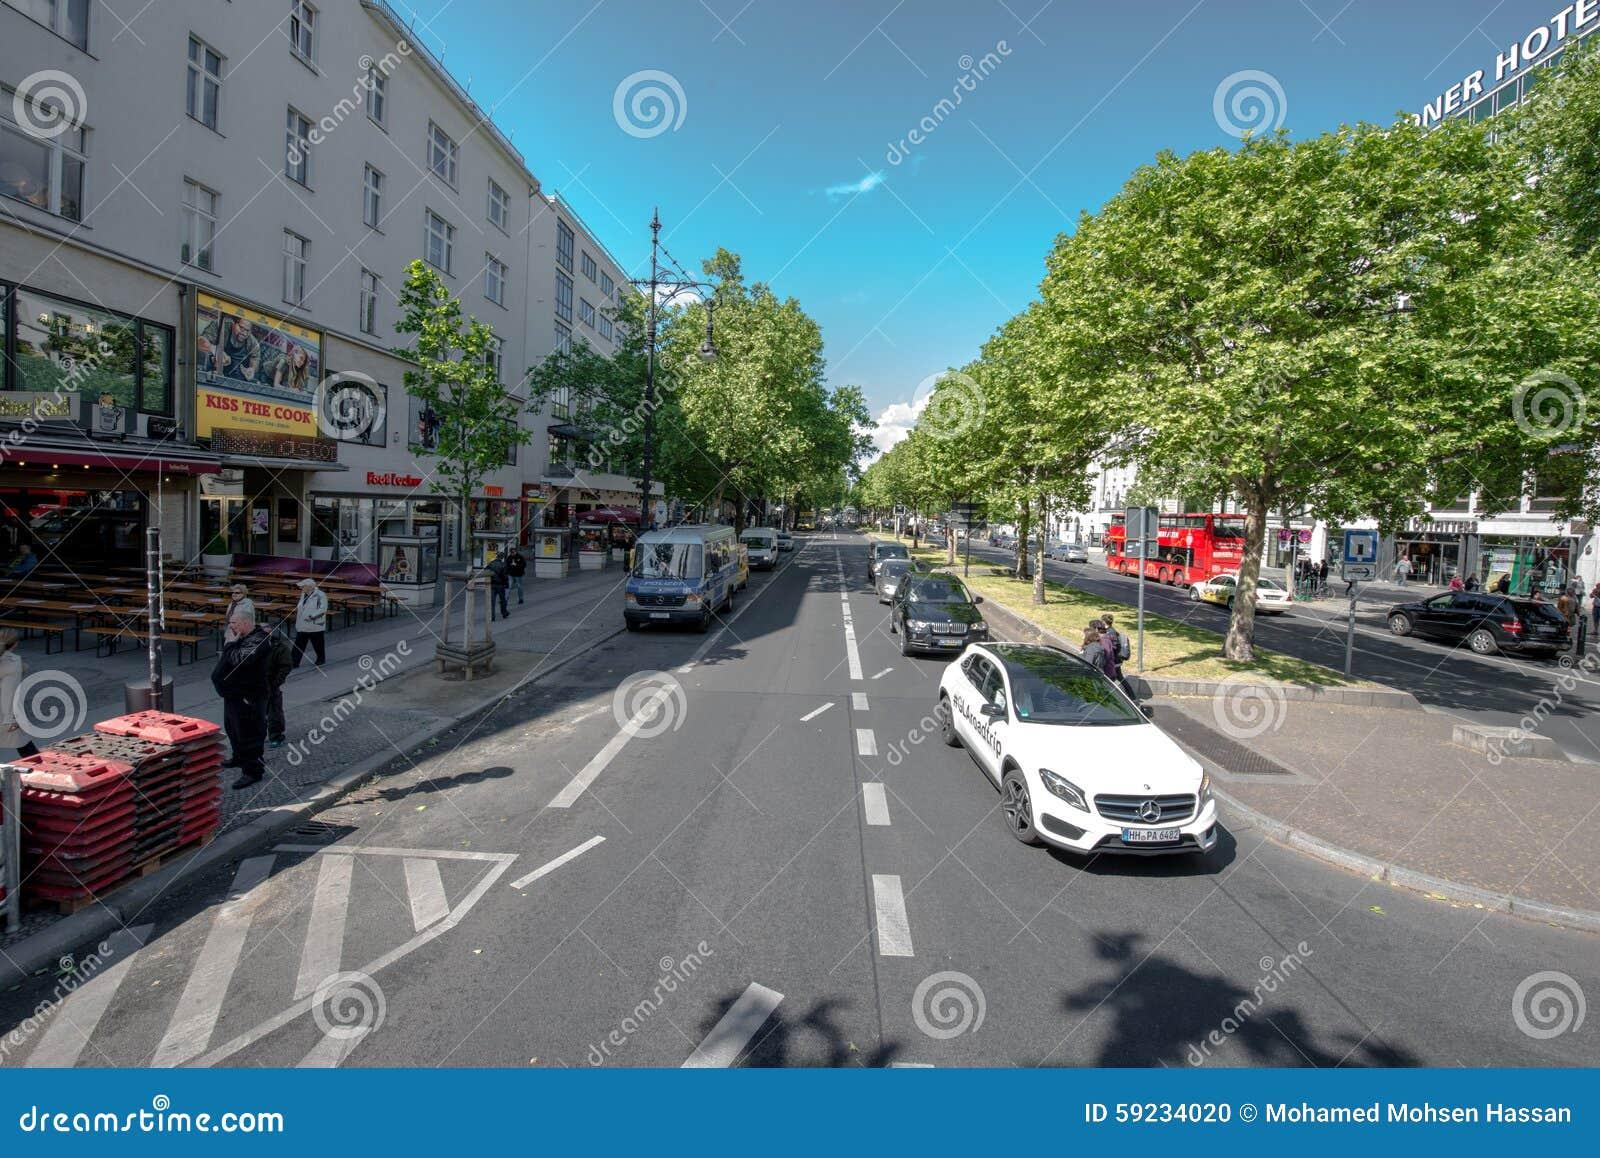 Download Calle en Berlín imagen editorial. Imagen de opiniónes - 59234020